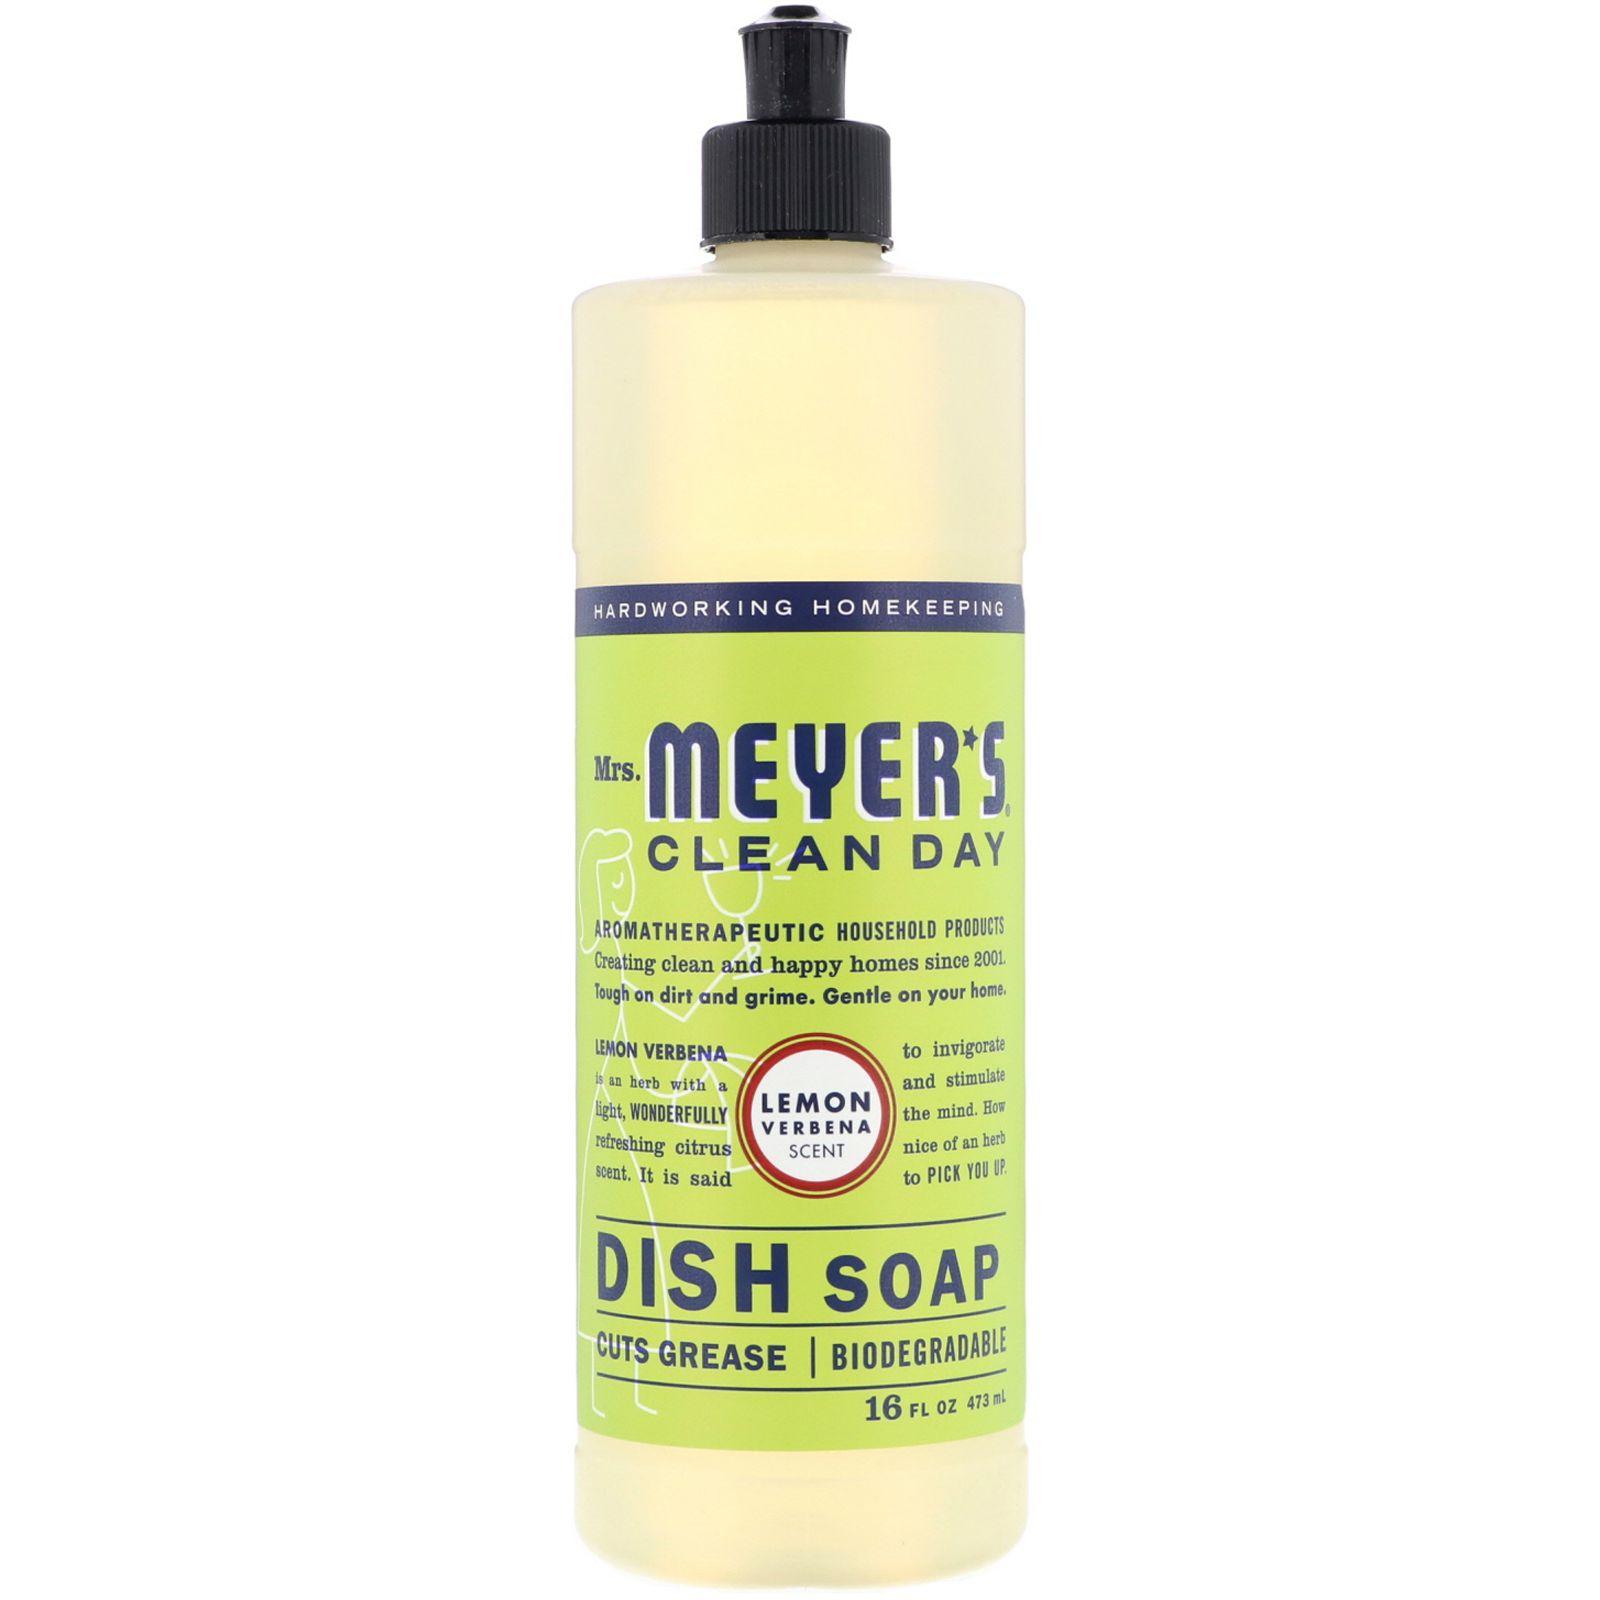 Lemon Verbena Dish Soap